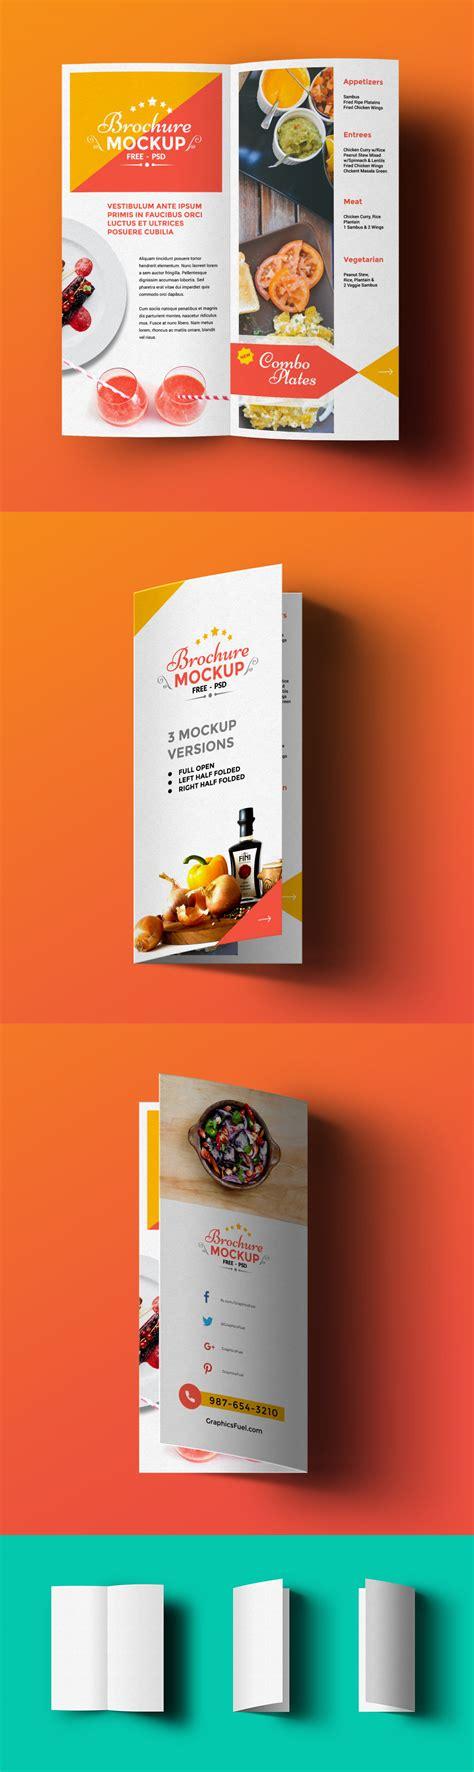 A Collection Of Free Psd Brochure Mockups Psd Bi Fold Mockup Template Vol2 Rar